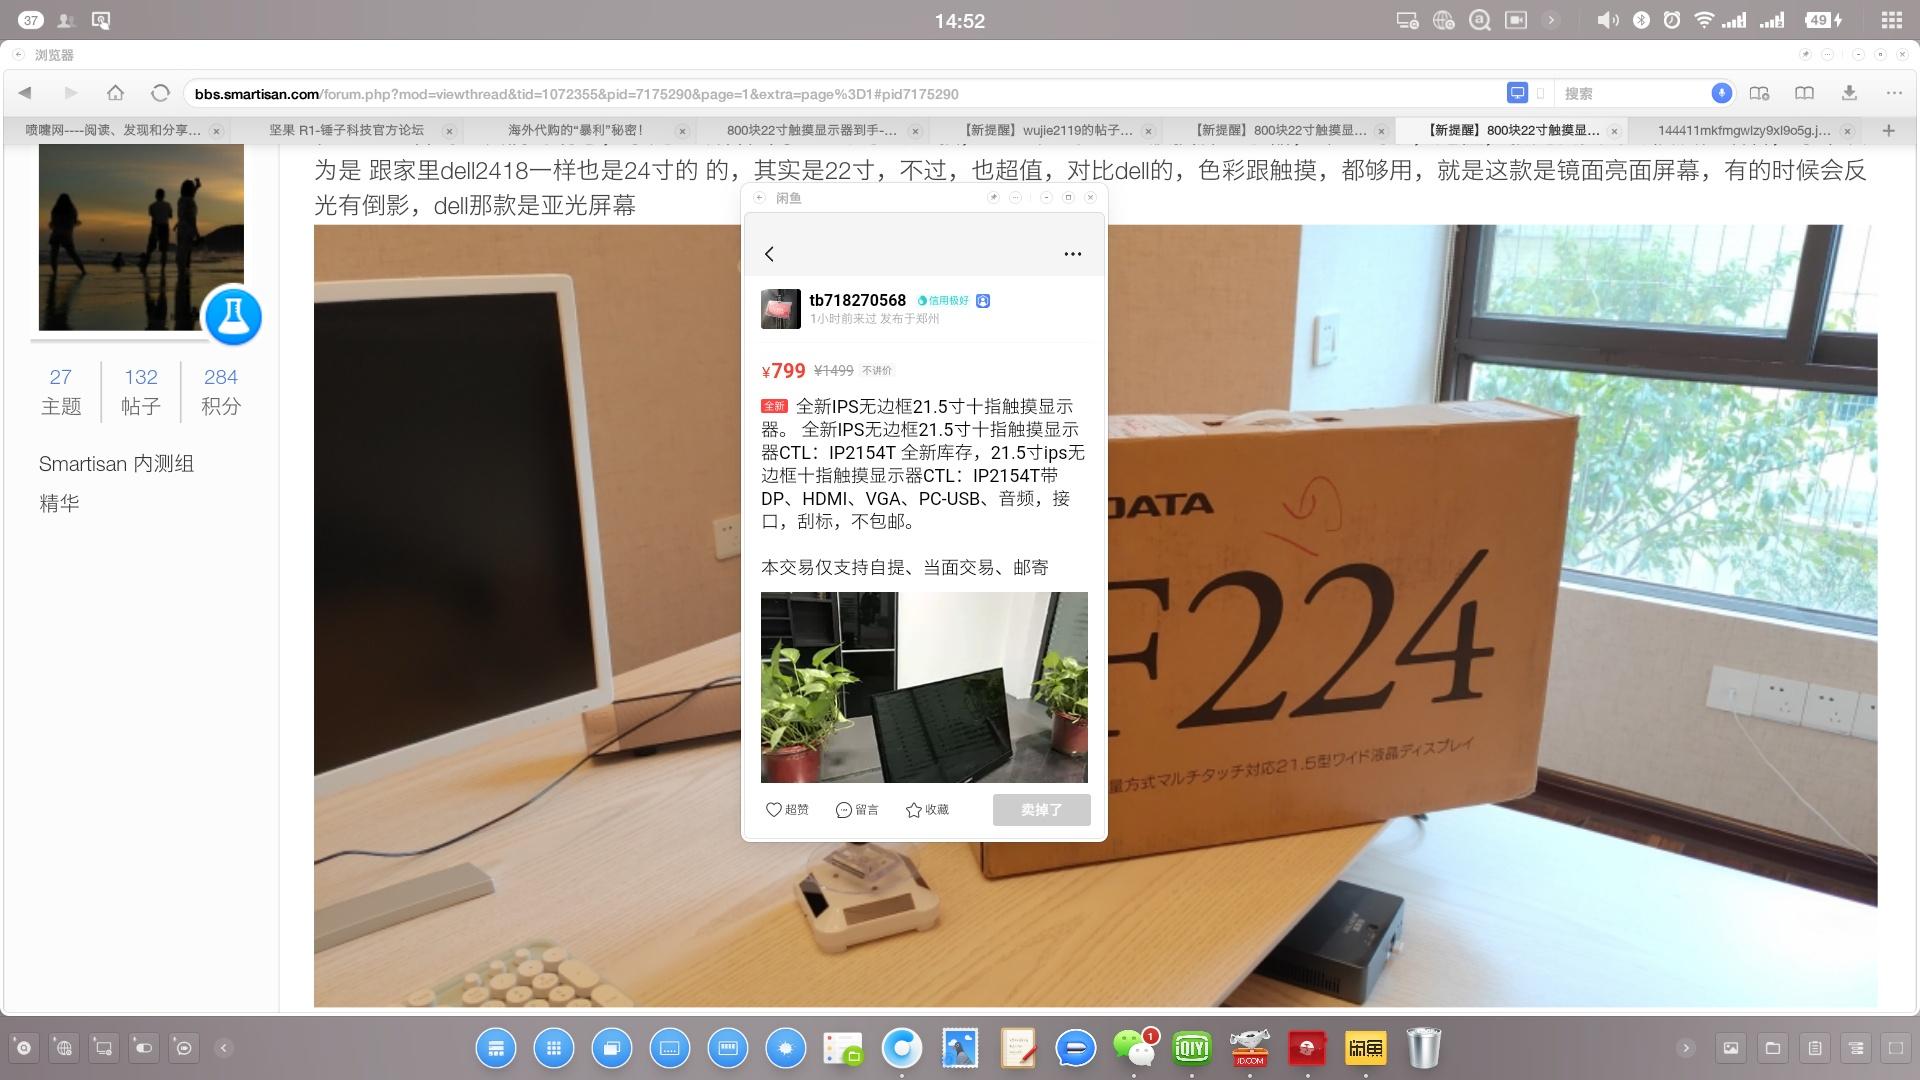 涂鸦_Screenshot_2018-12-31-14-52-50-642_fullscreen.jpg